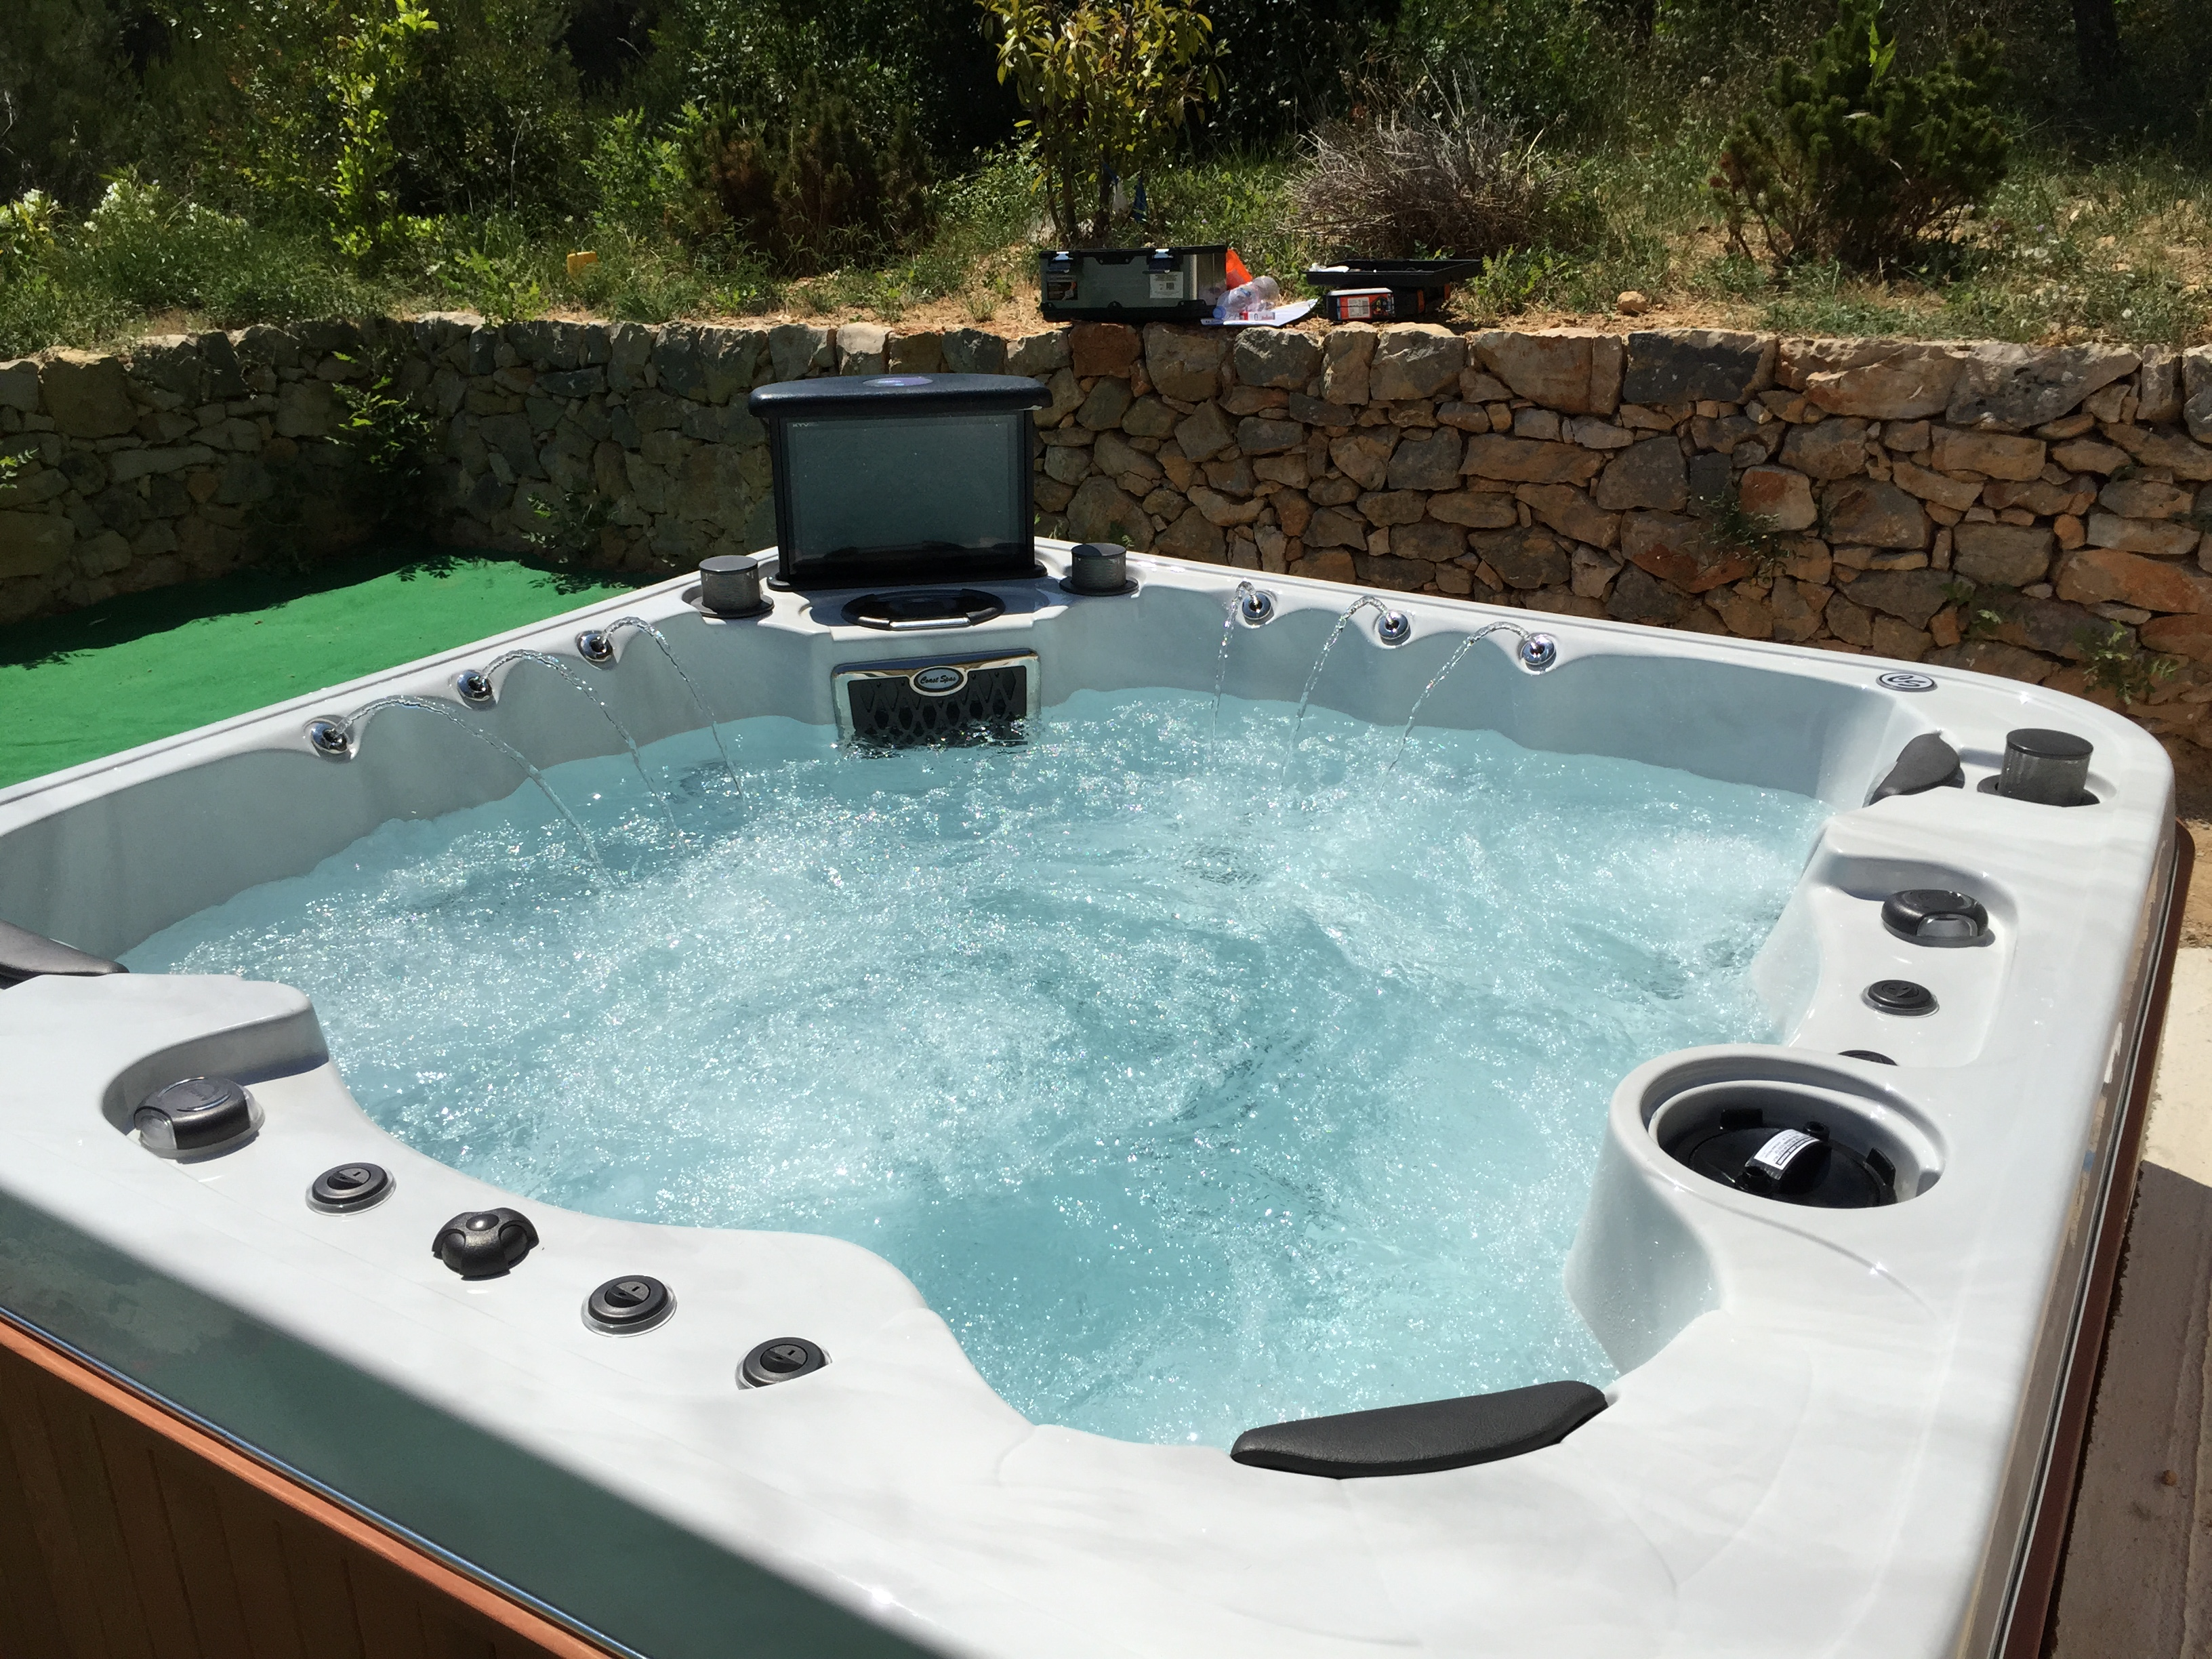 installateur spa entreprise installation spa sani spa. Black Bedroom Furniture Sets. Home Design Ideas